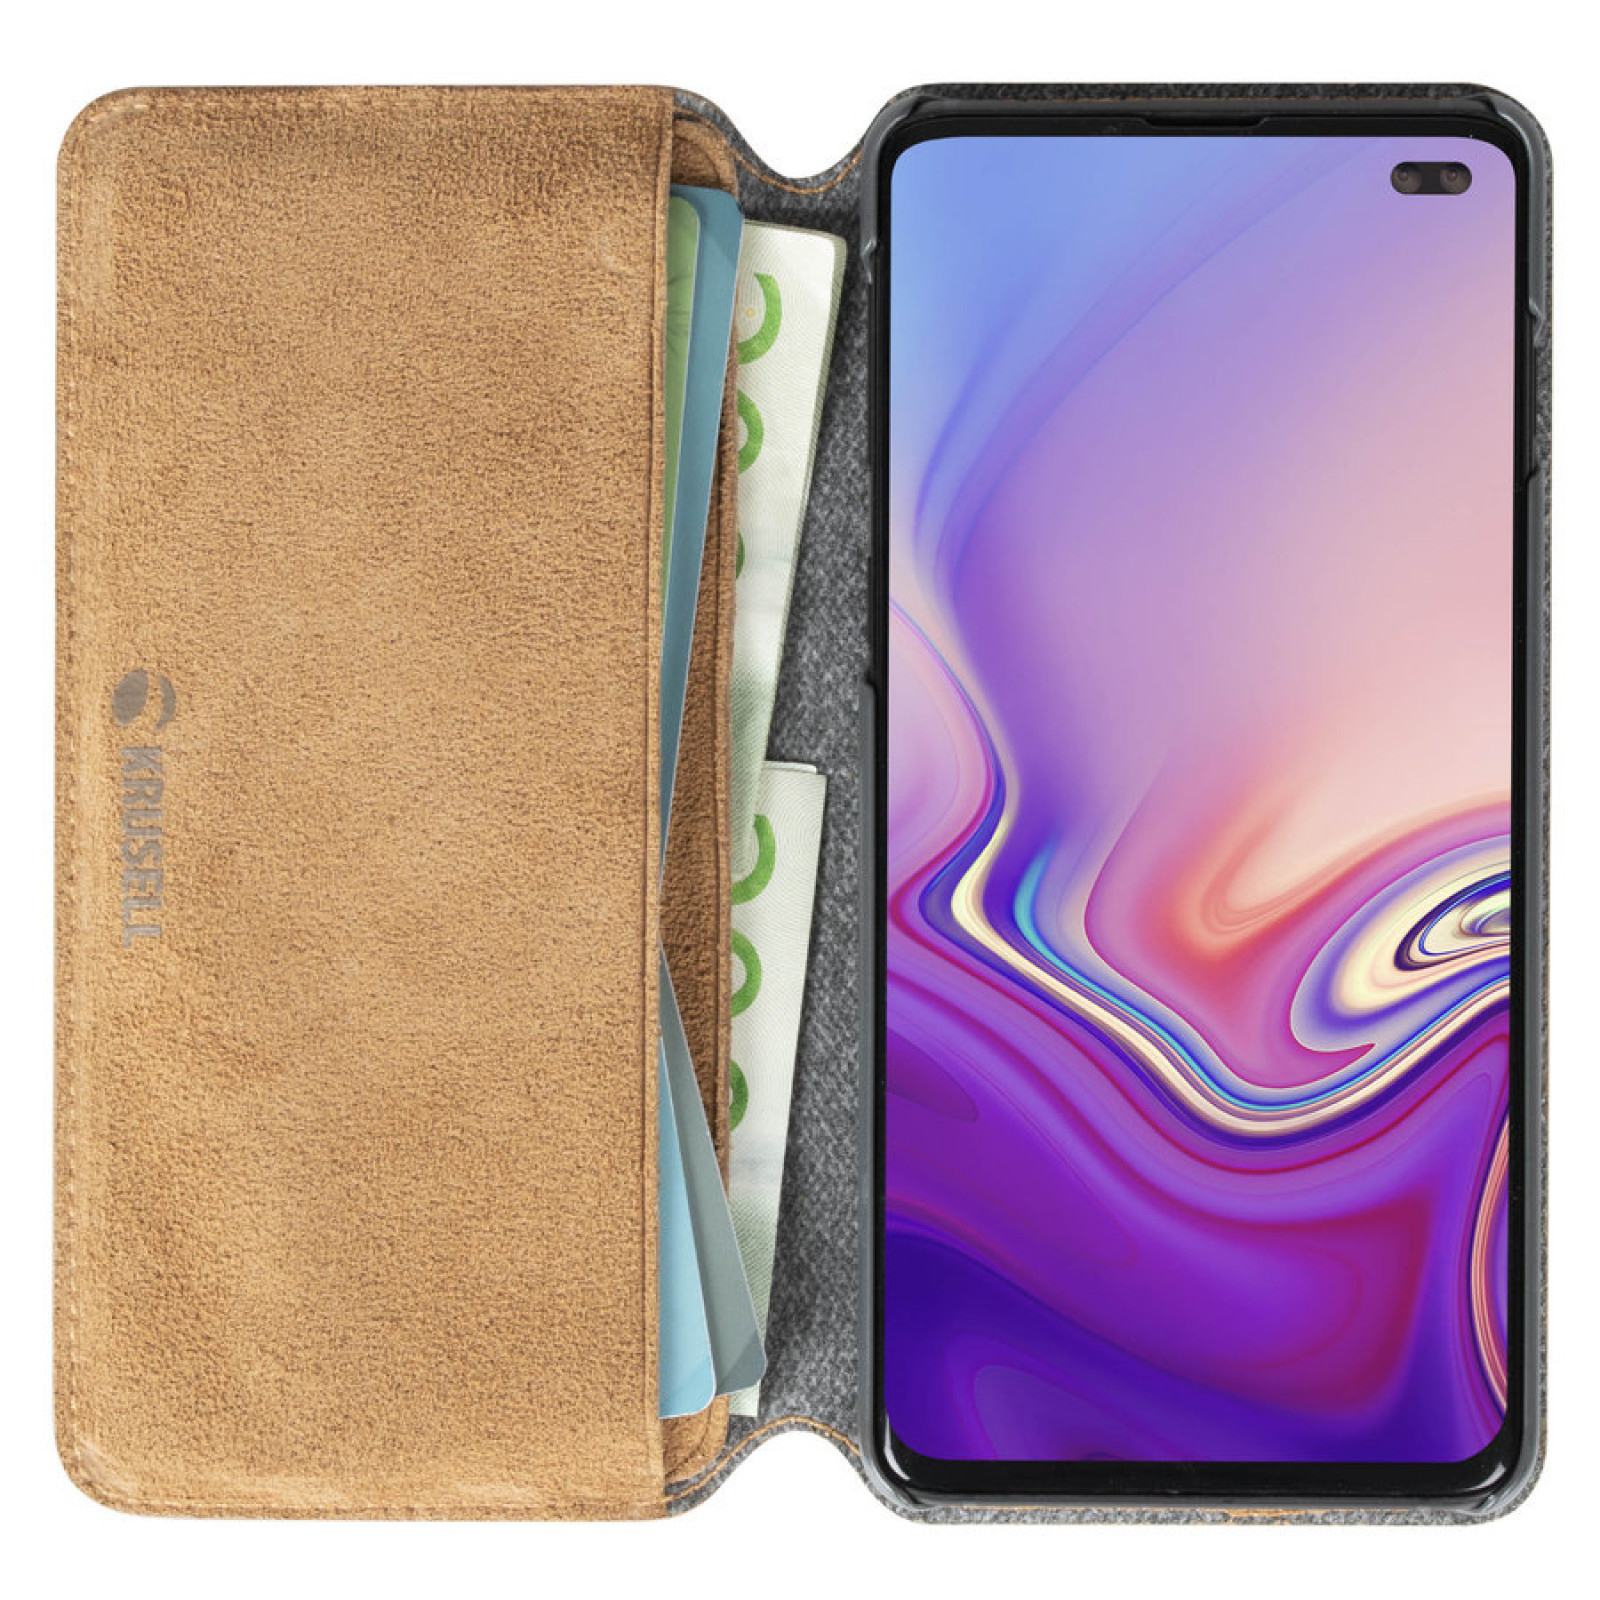 Калъф Krusell Broby 4 Card SlimWallet естествен велур за Samsung Galaxy S10 plus Cognac